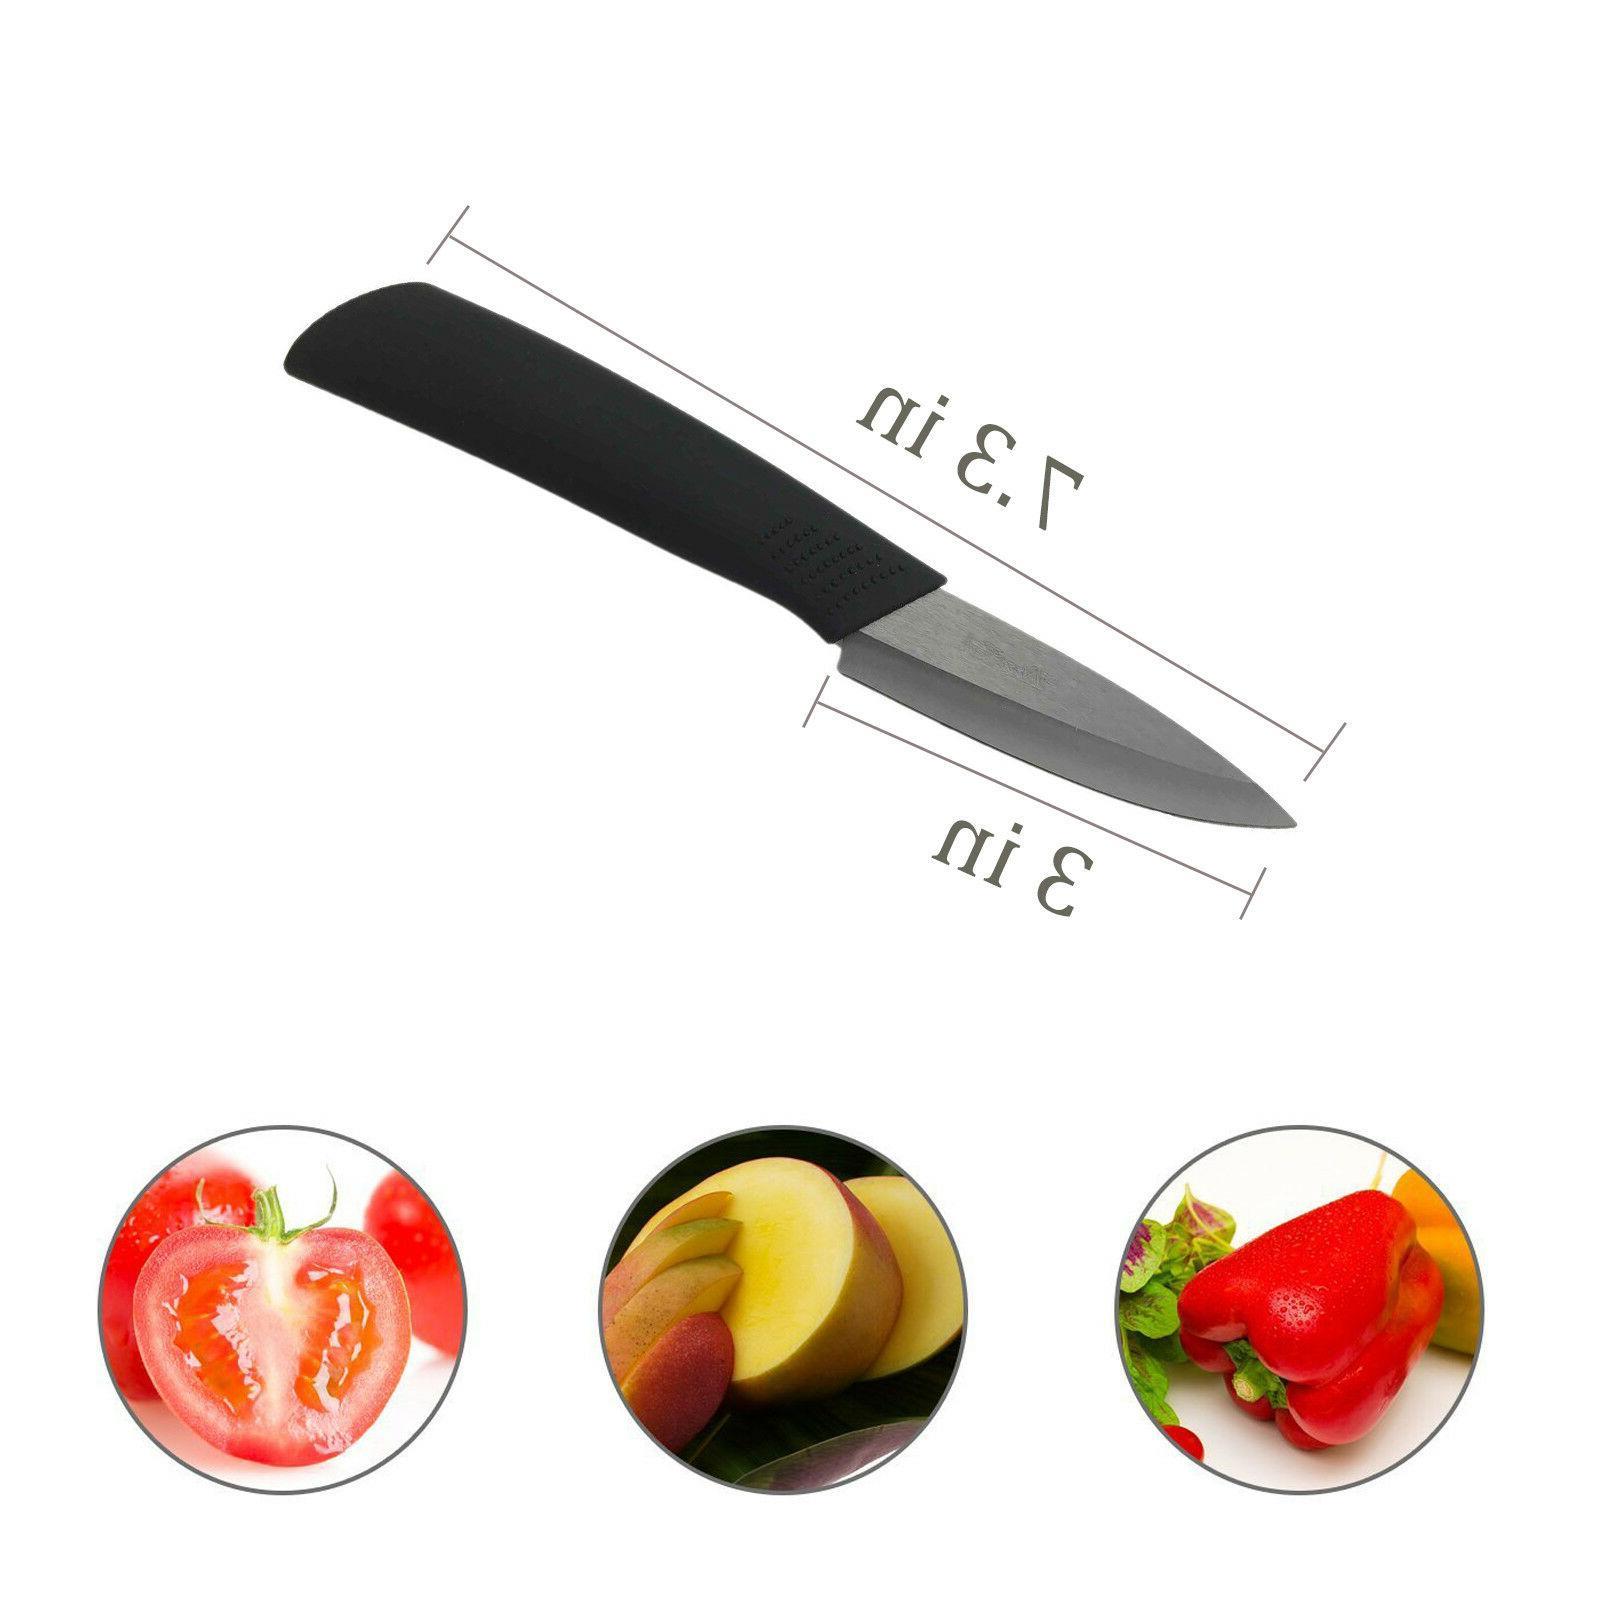 "Blade Ceramic knife Set Kitchen 3"" 4"" 5"" Peeler Cutlery"